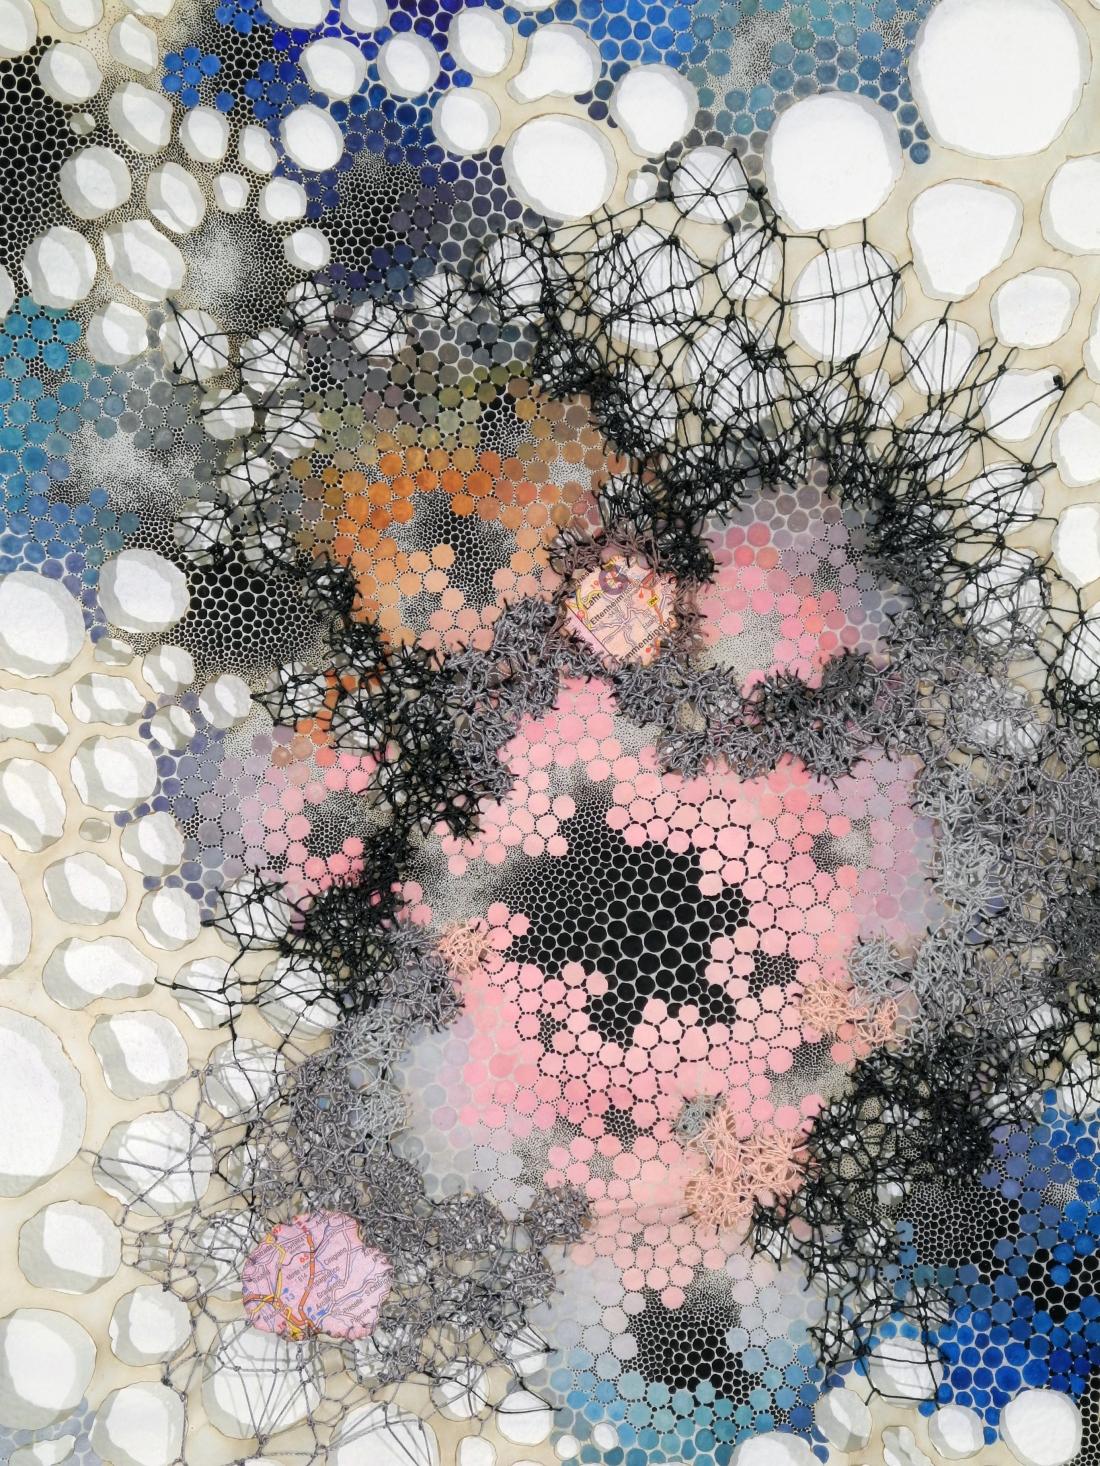 "Cathexis Karen Margolis Cathexis, 2017 watercolor, gouache, maps, thread on Abaca paper 24""x18"" Courtesy of the artist and Garis & Hahn"